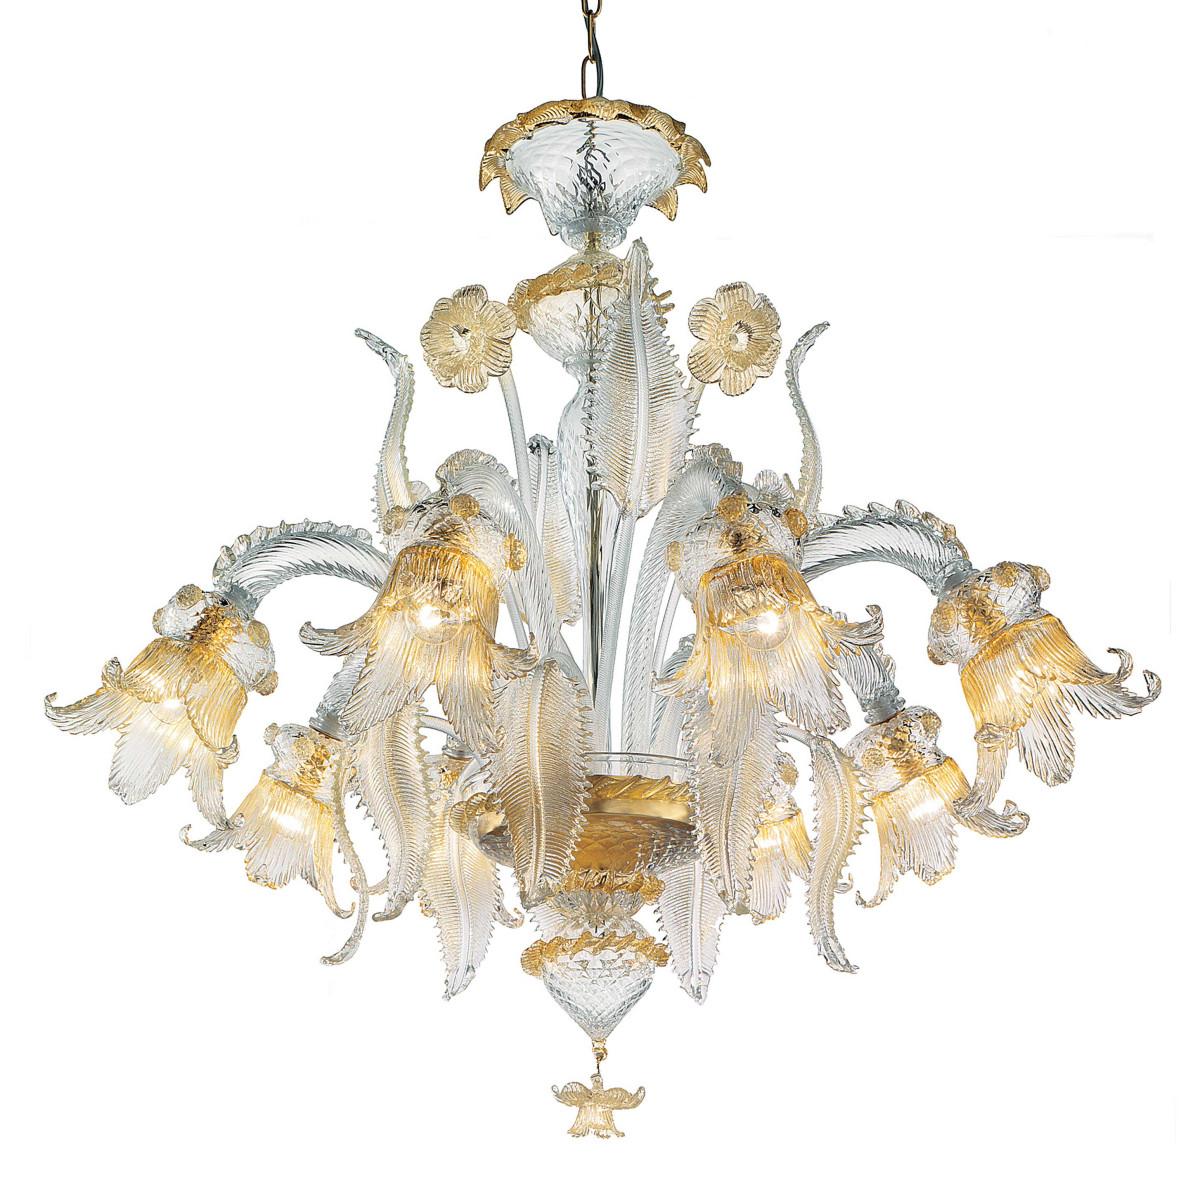 Fenice 6 luces lampara en cristal de Murano - color oro transparente